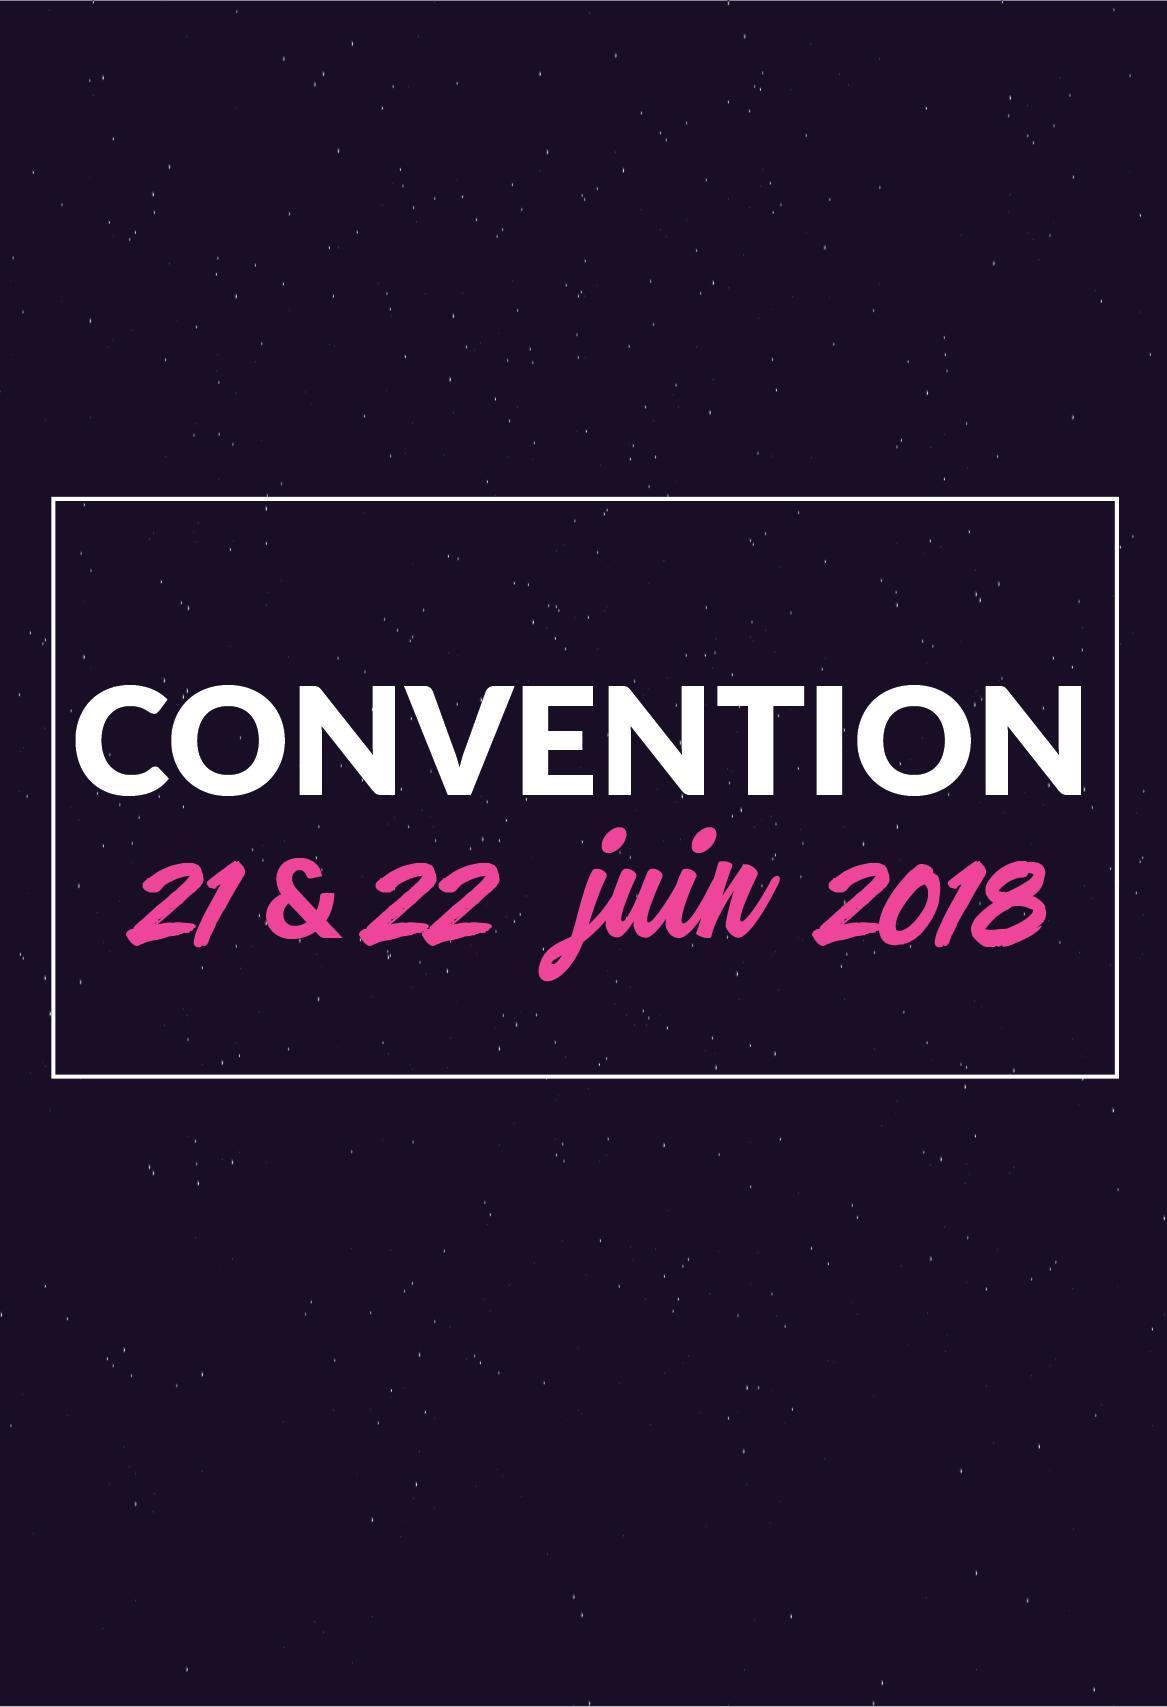 Convention_dates